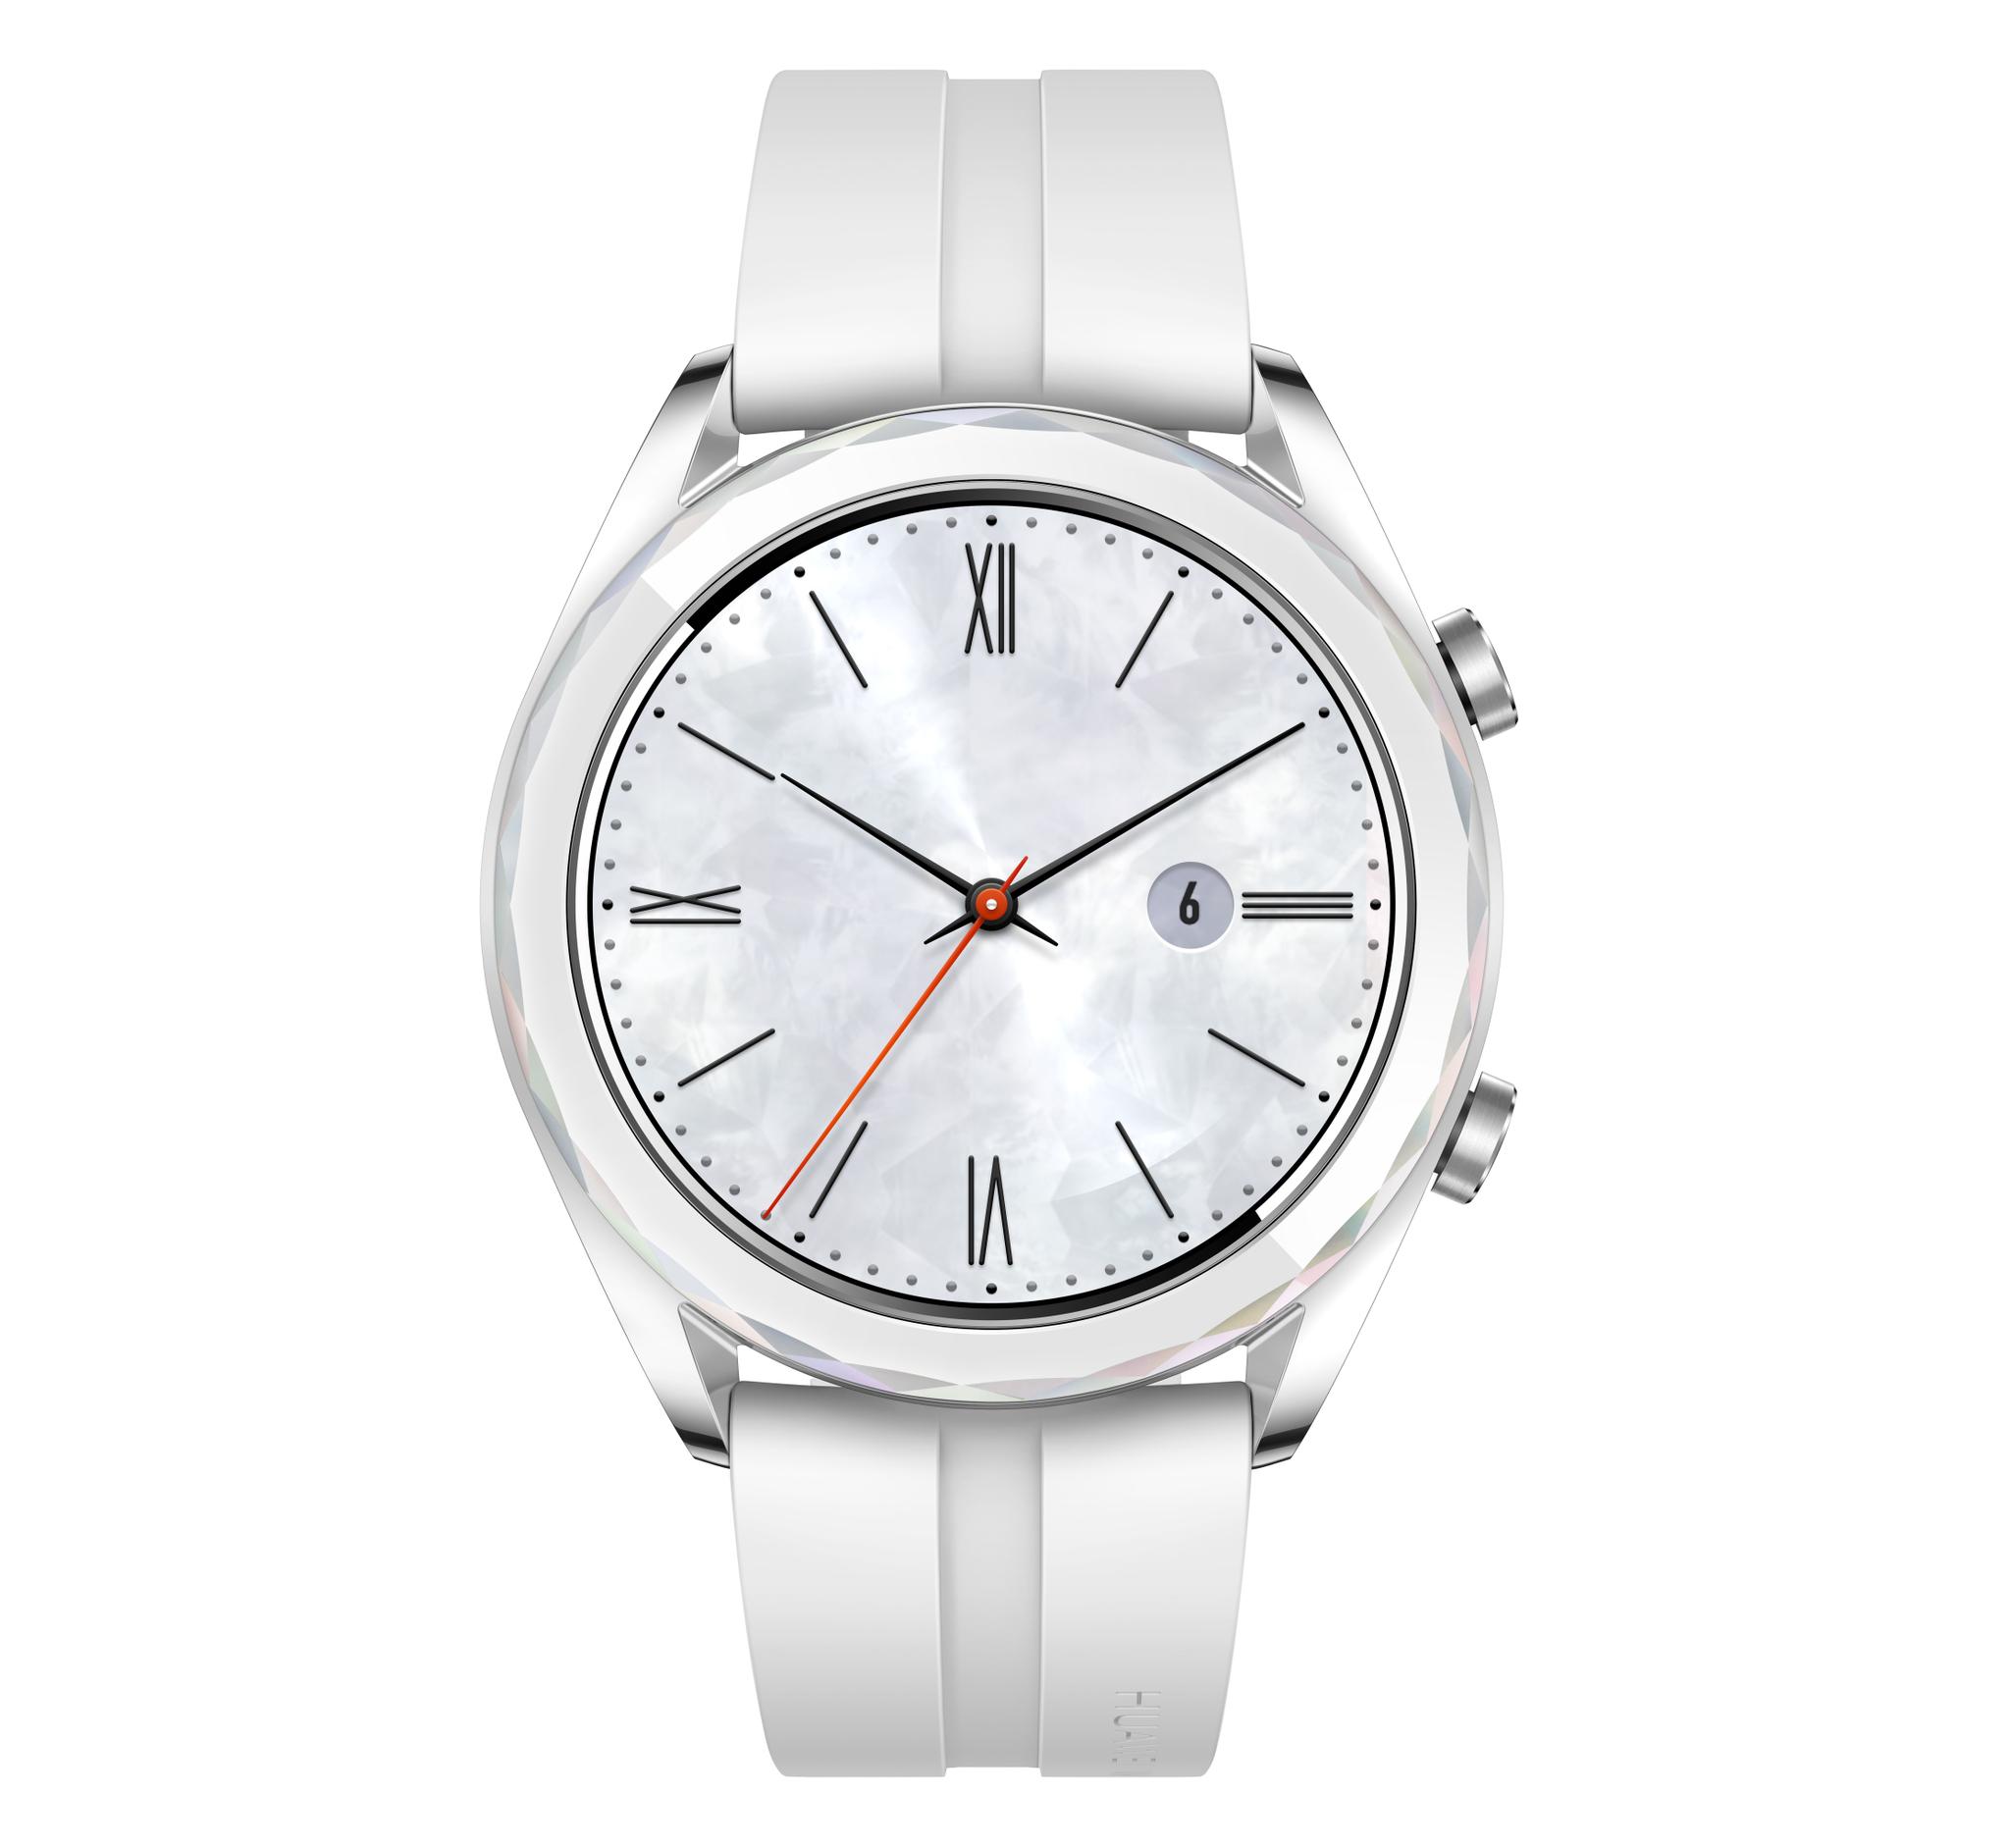 Il nuovo smartwatch di Huawei | Fashion Times